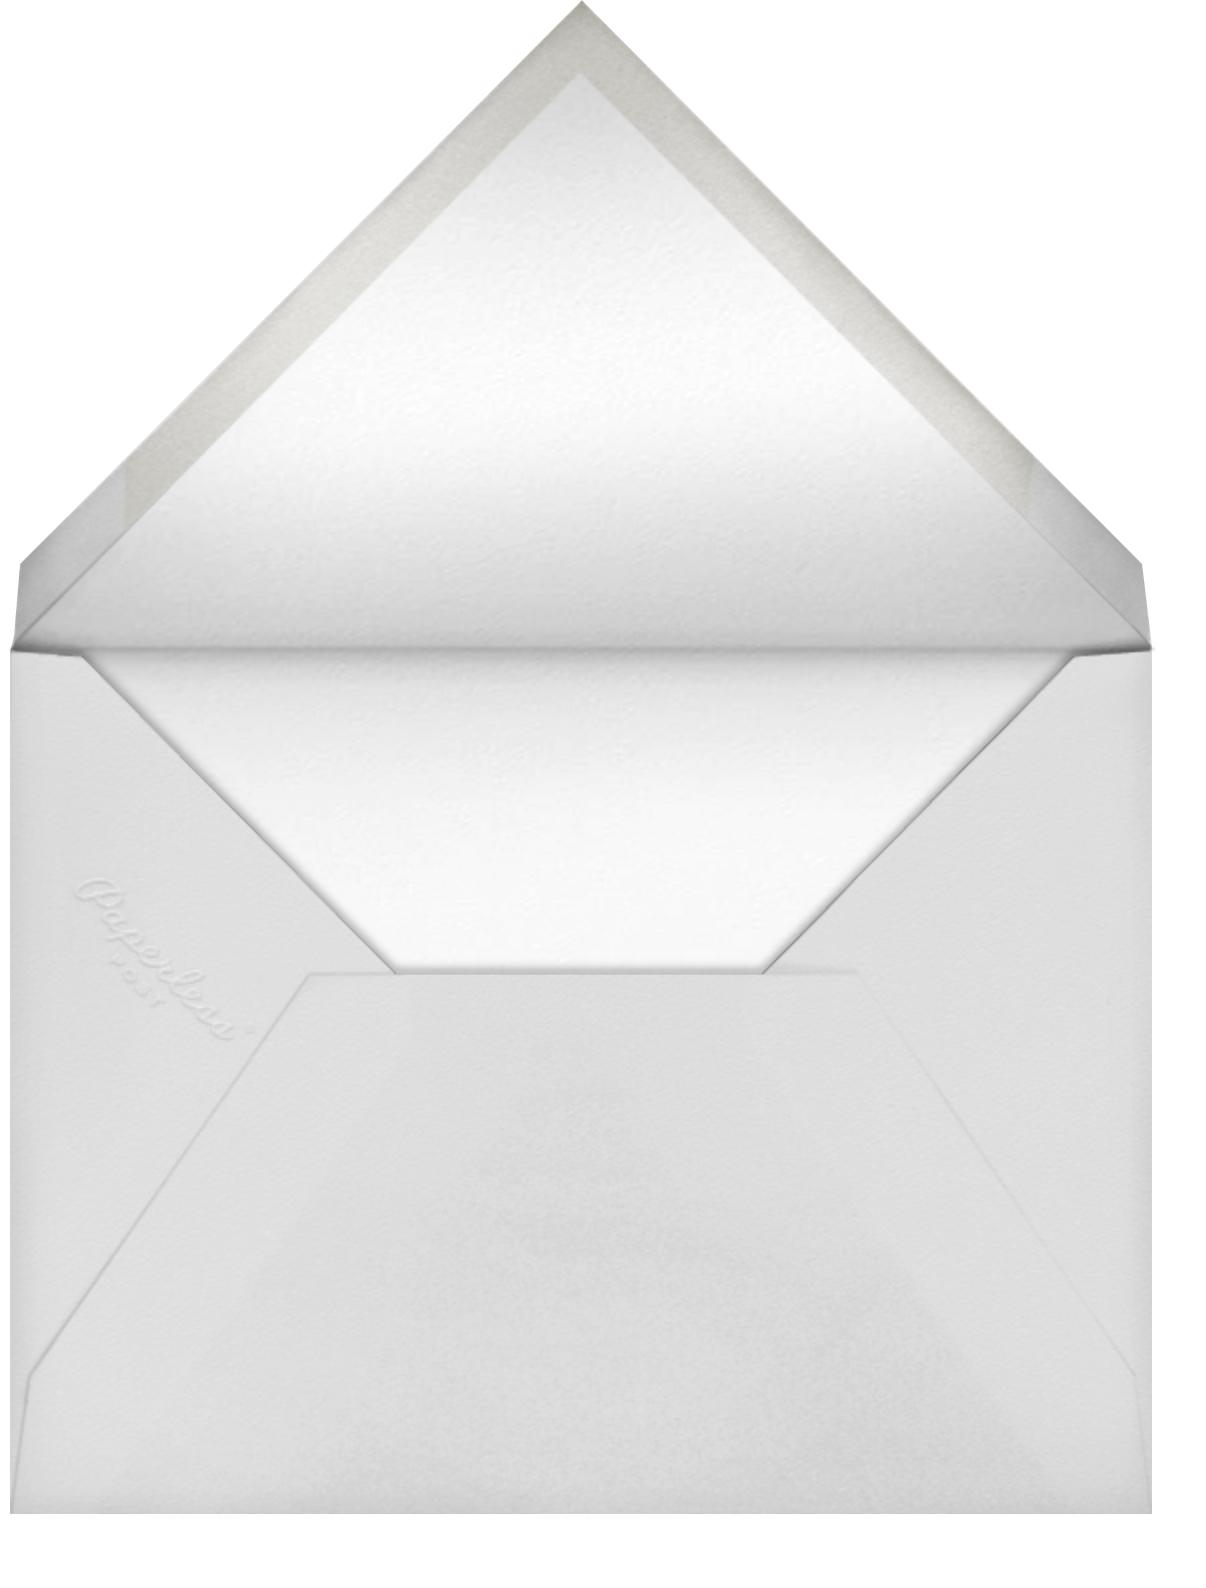 Fleurs d'Alençon (Invitation) - Antwerp - Oscar de la Renta - All - envelope back